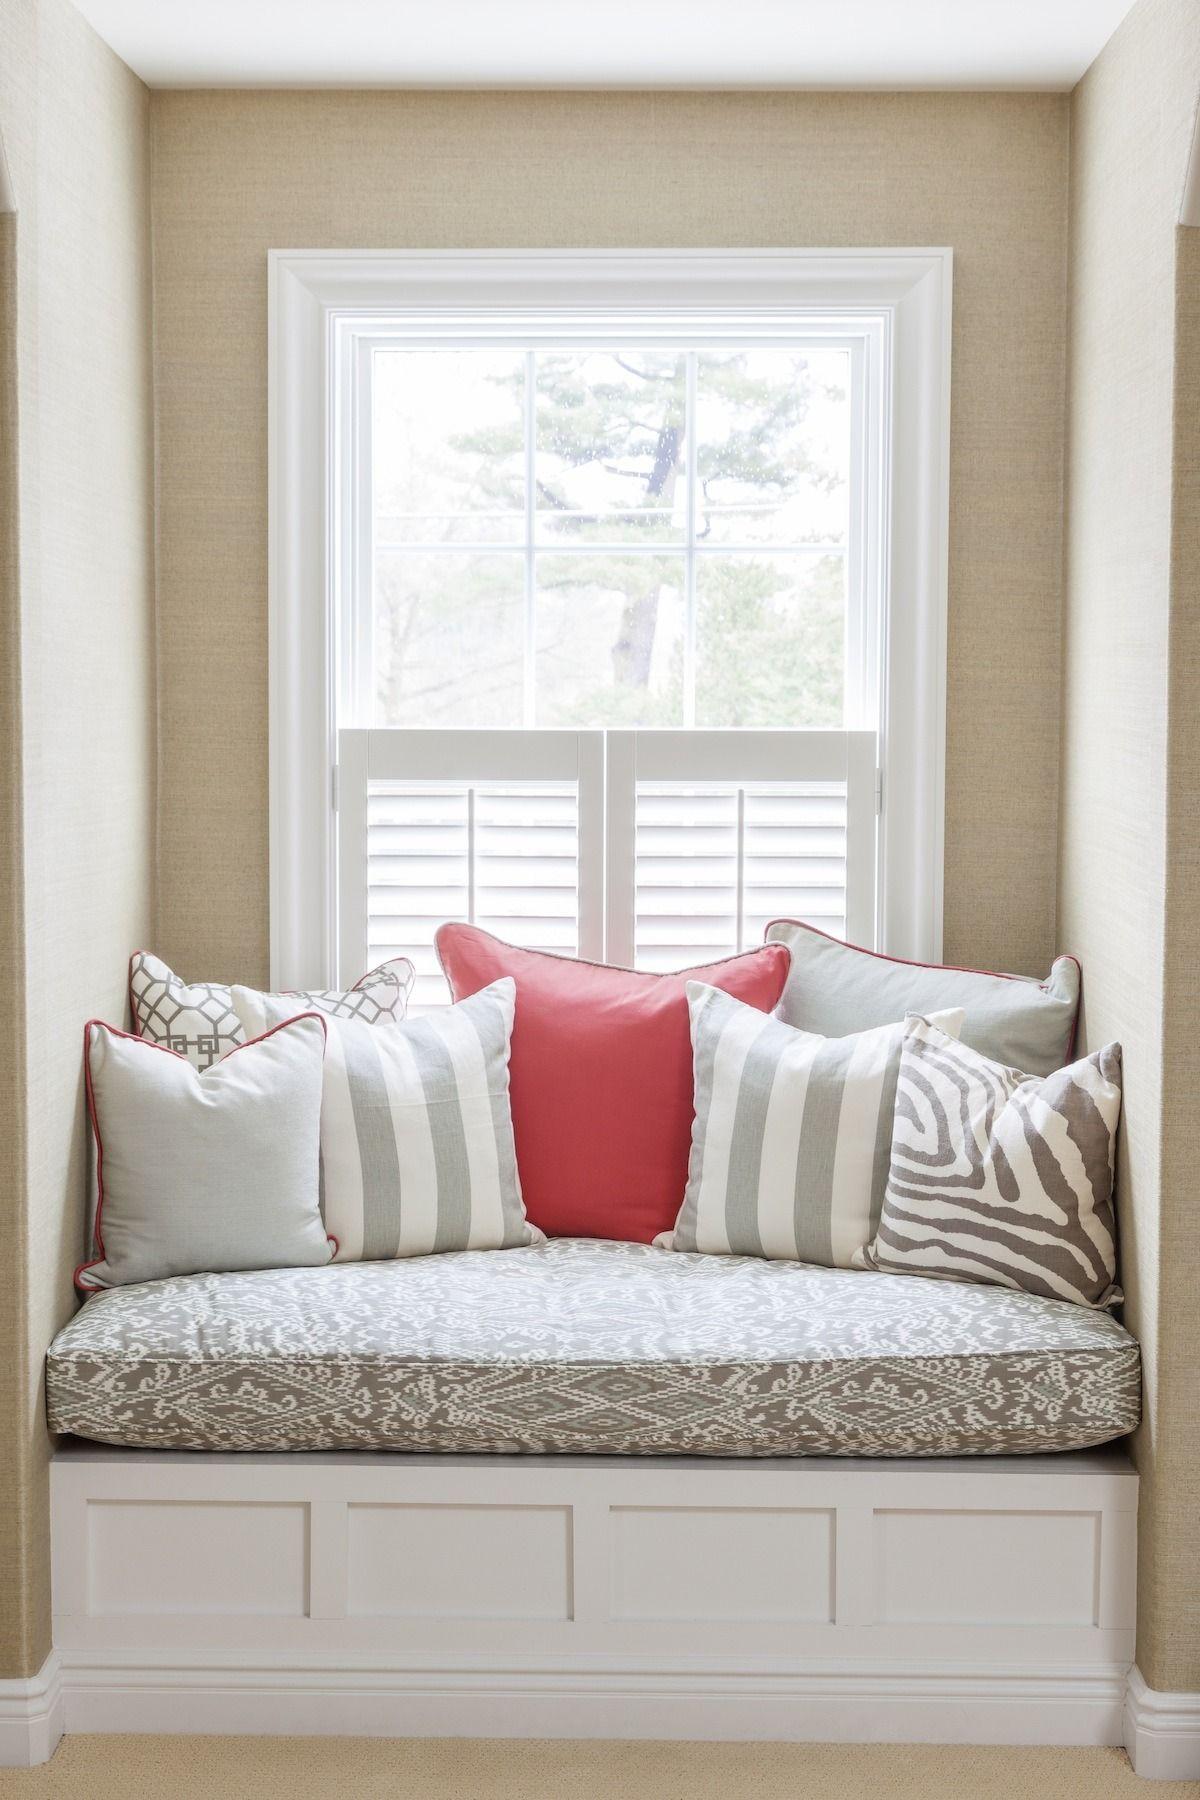 New England Home | Bedroom windows, Window and Future